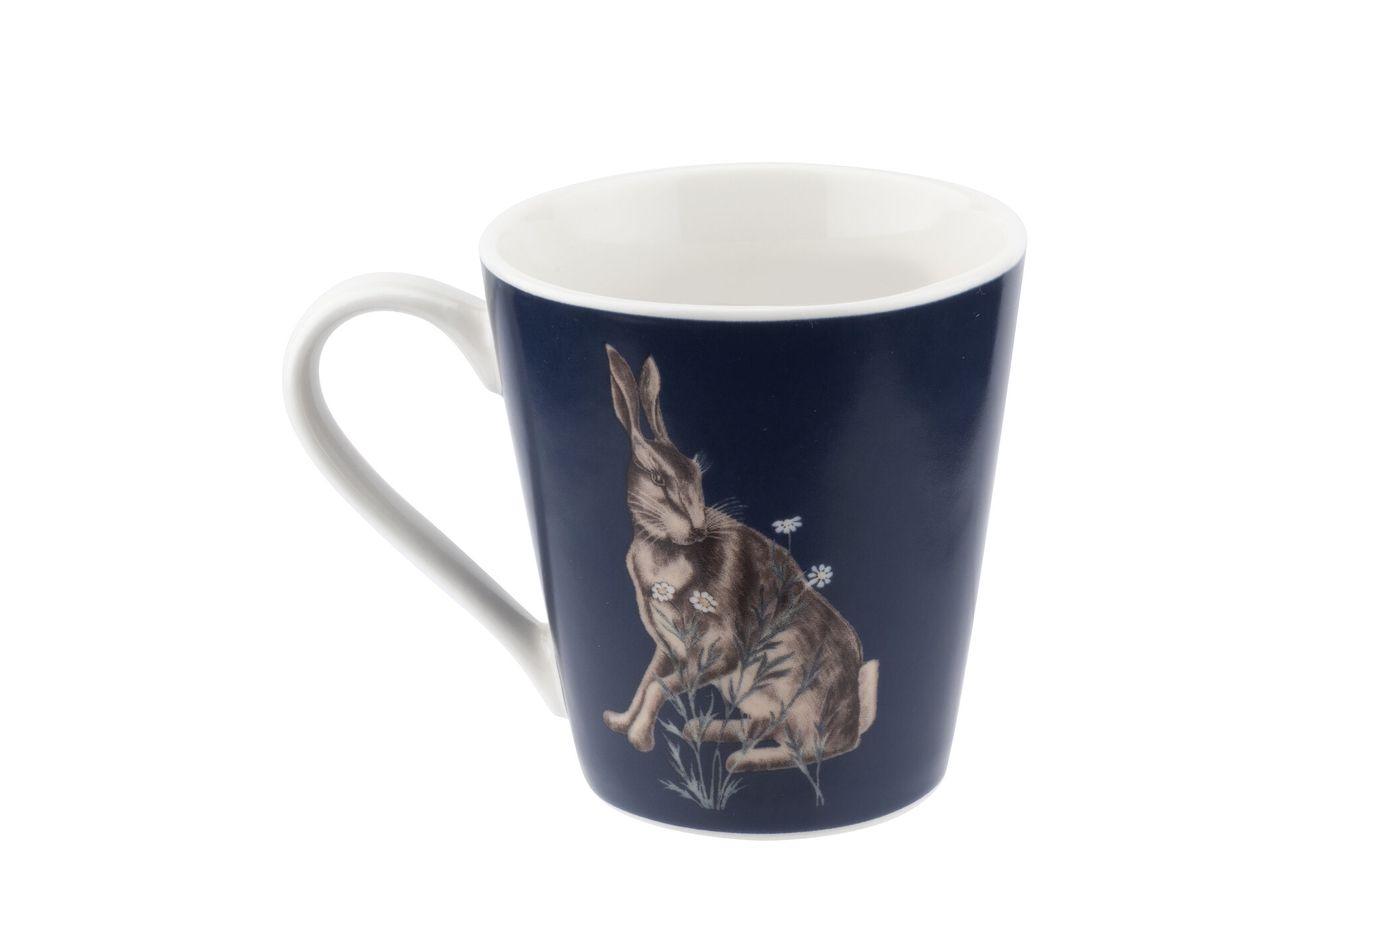 Spode The Original Morris & Co. Mug and Tray Set Wightwick thumb 4